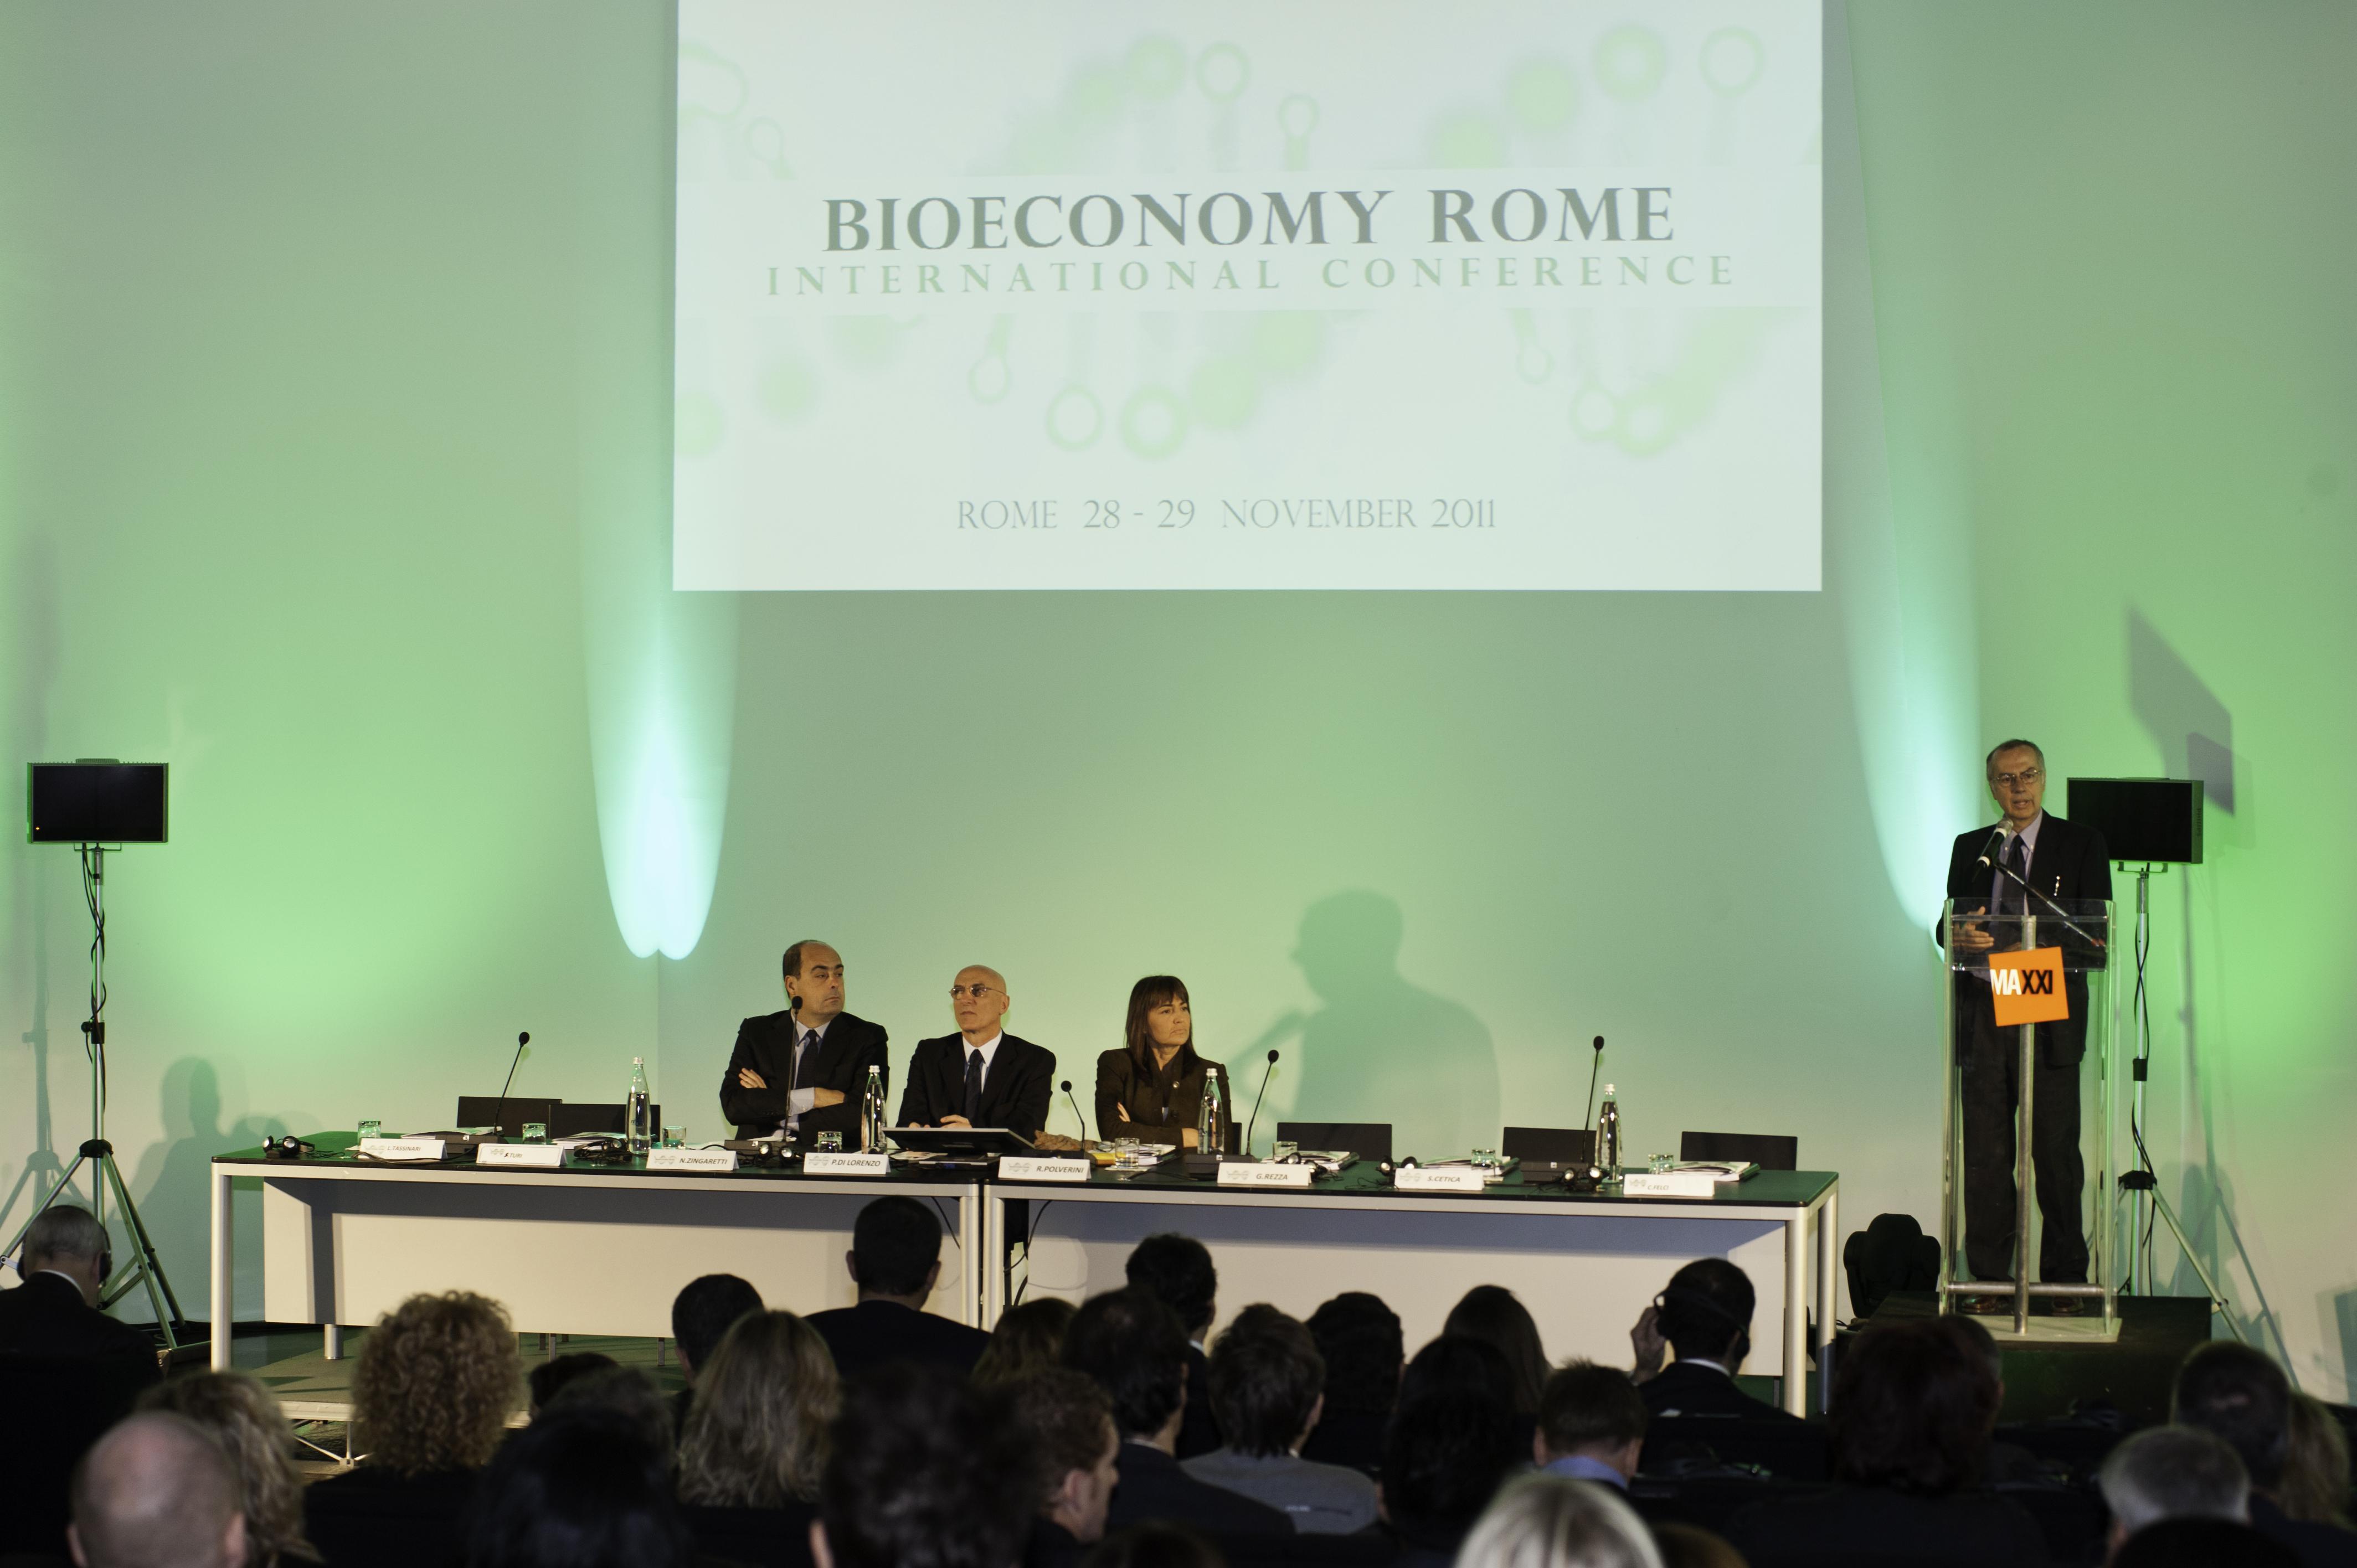 Piero Di Lorenzo Bioeconomy 2011